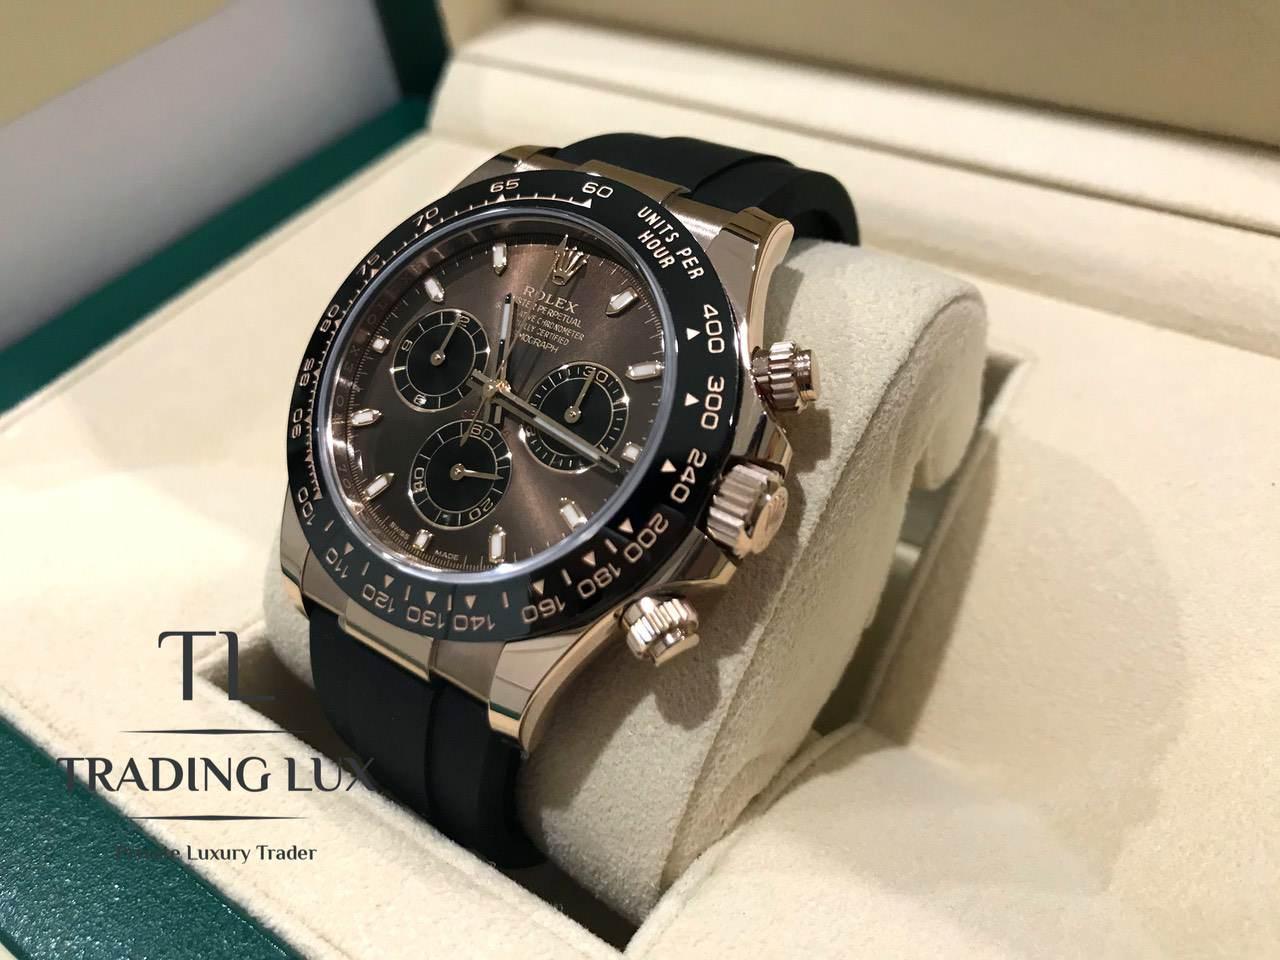 Rolex-Daytona-116515LN-Chocolate-4